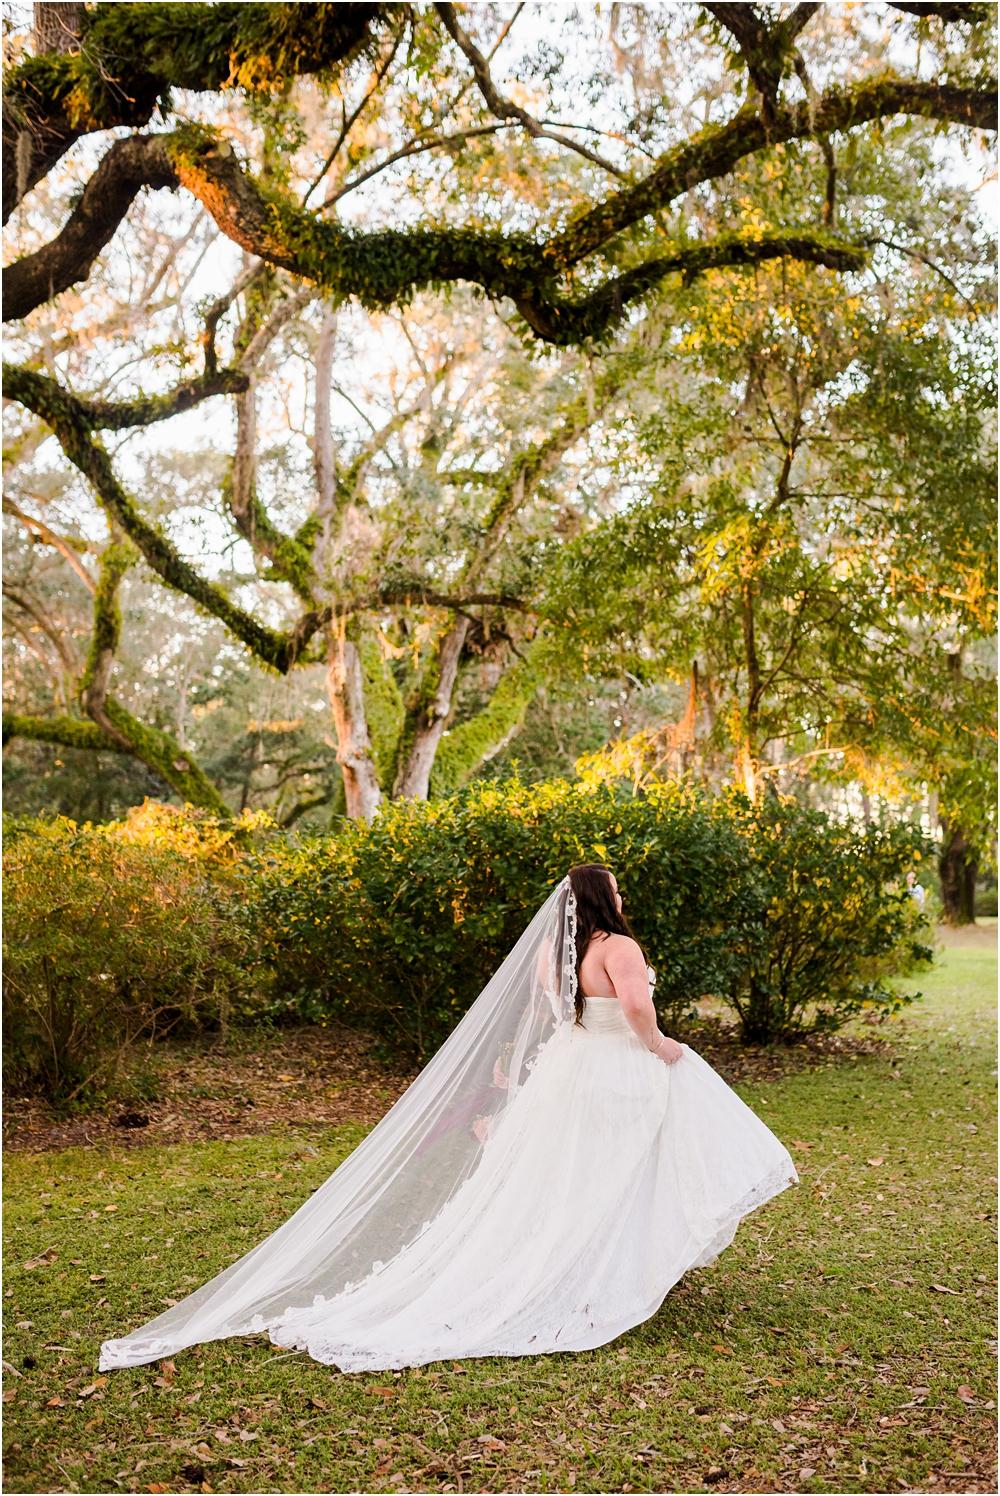 Eden-Gardens-florida-wedding-photographer-kiersten-stevenson-photography-104.jpg